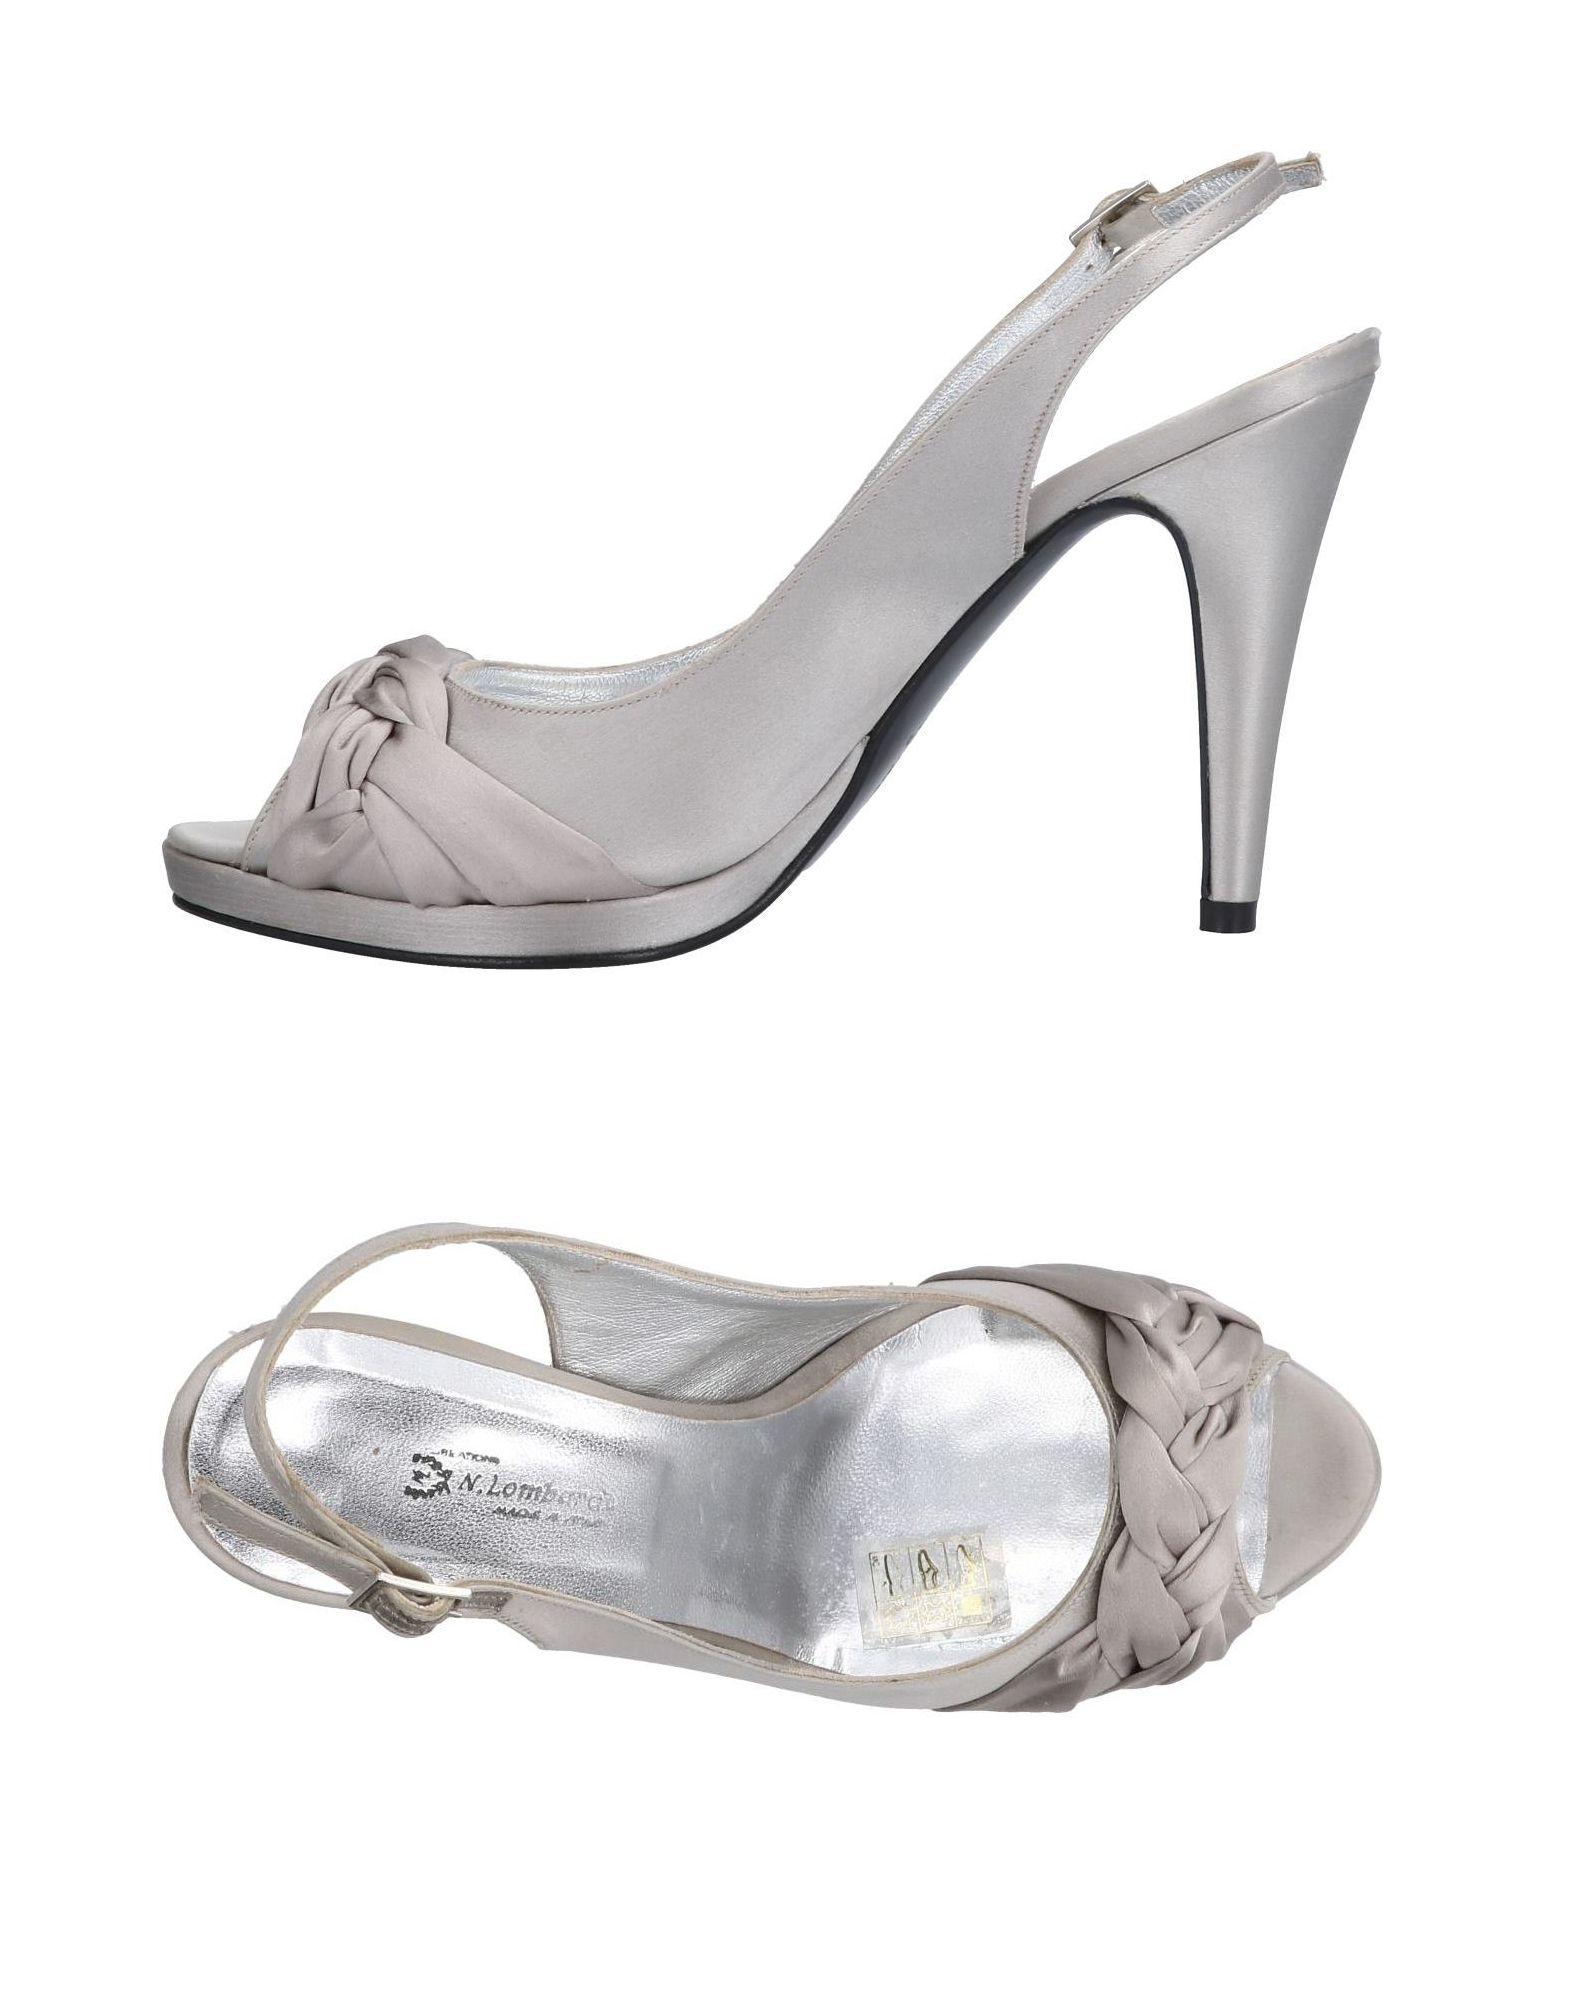 N.Lombardo Sandals Sandals - Women N.Lombardo Sandals N.Lombardo online on  United Kingdom - 11498567MU b83e21